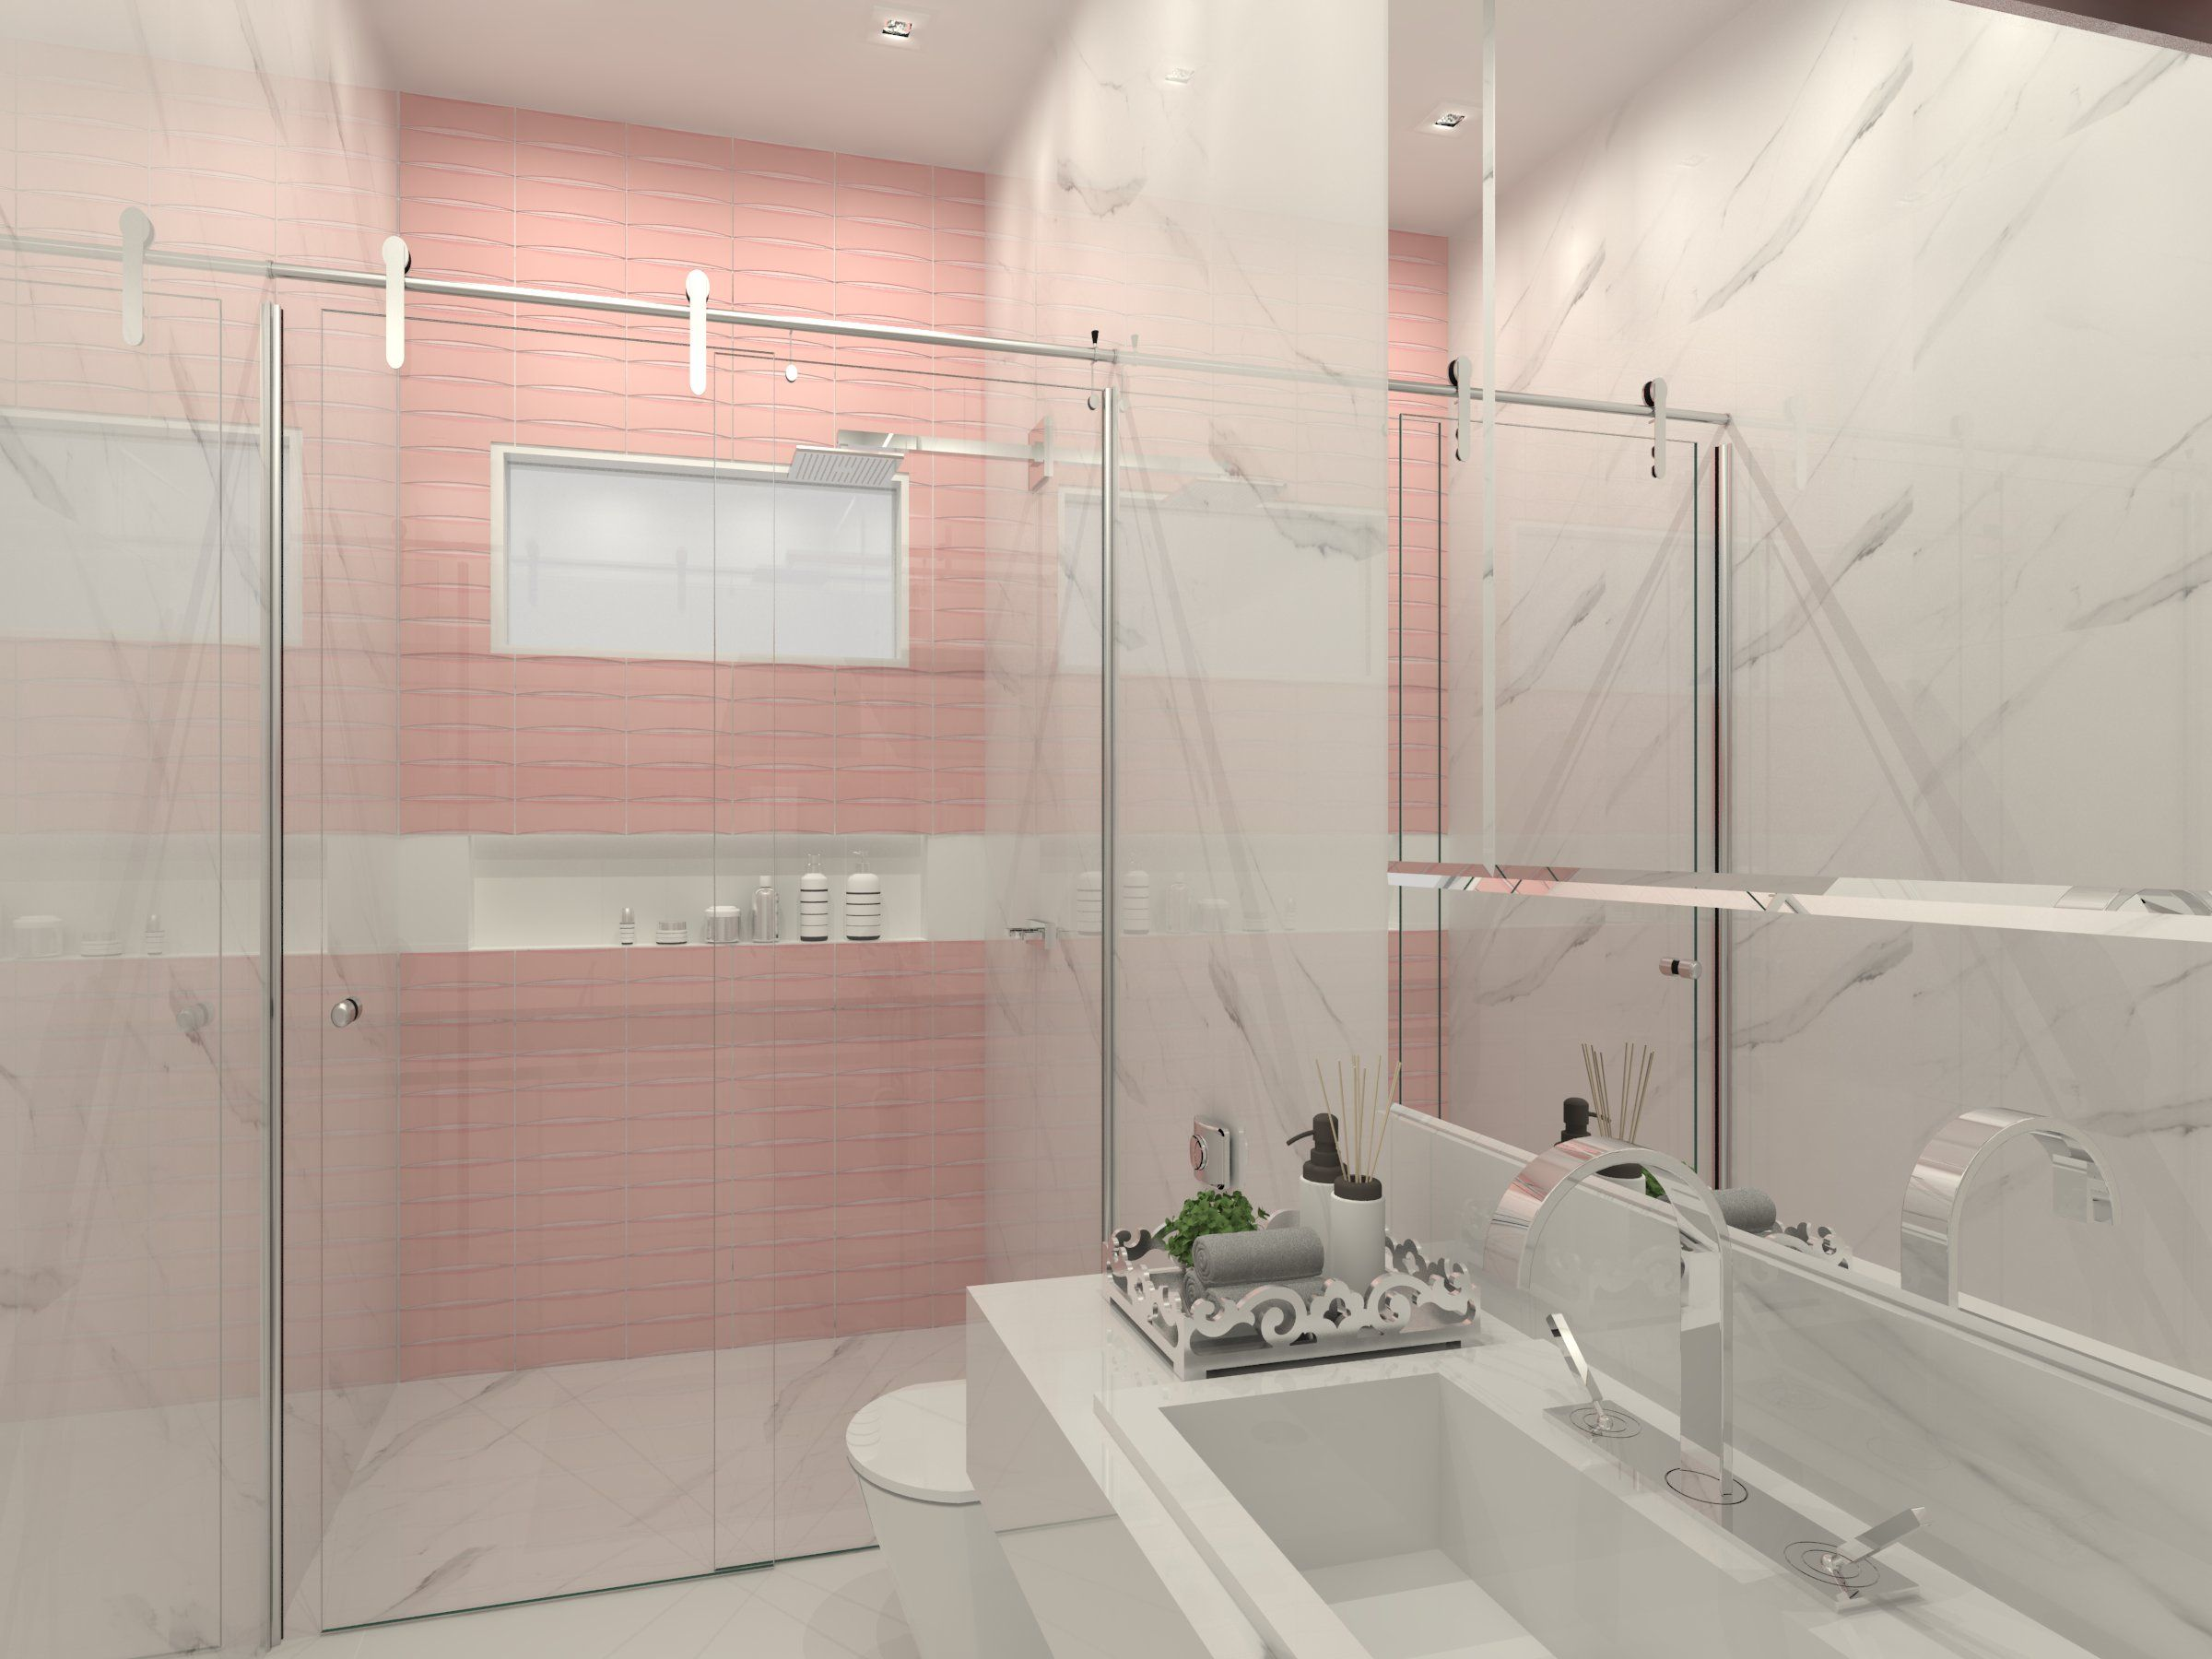 Banheiro de mo a utilizando o calacata e o bella vita spk for Ceramica bellavista